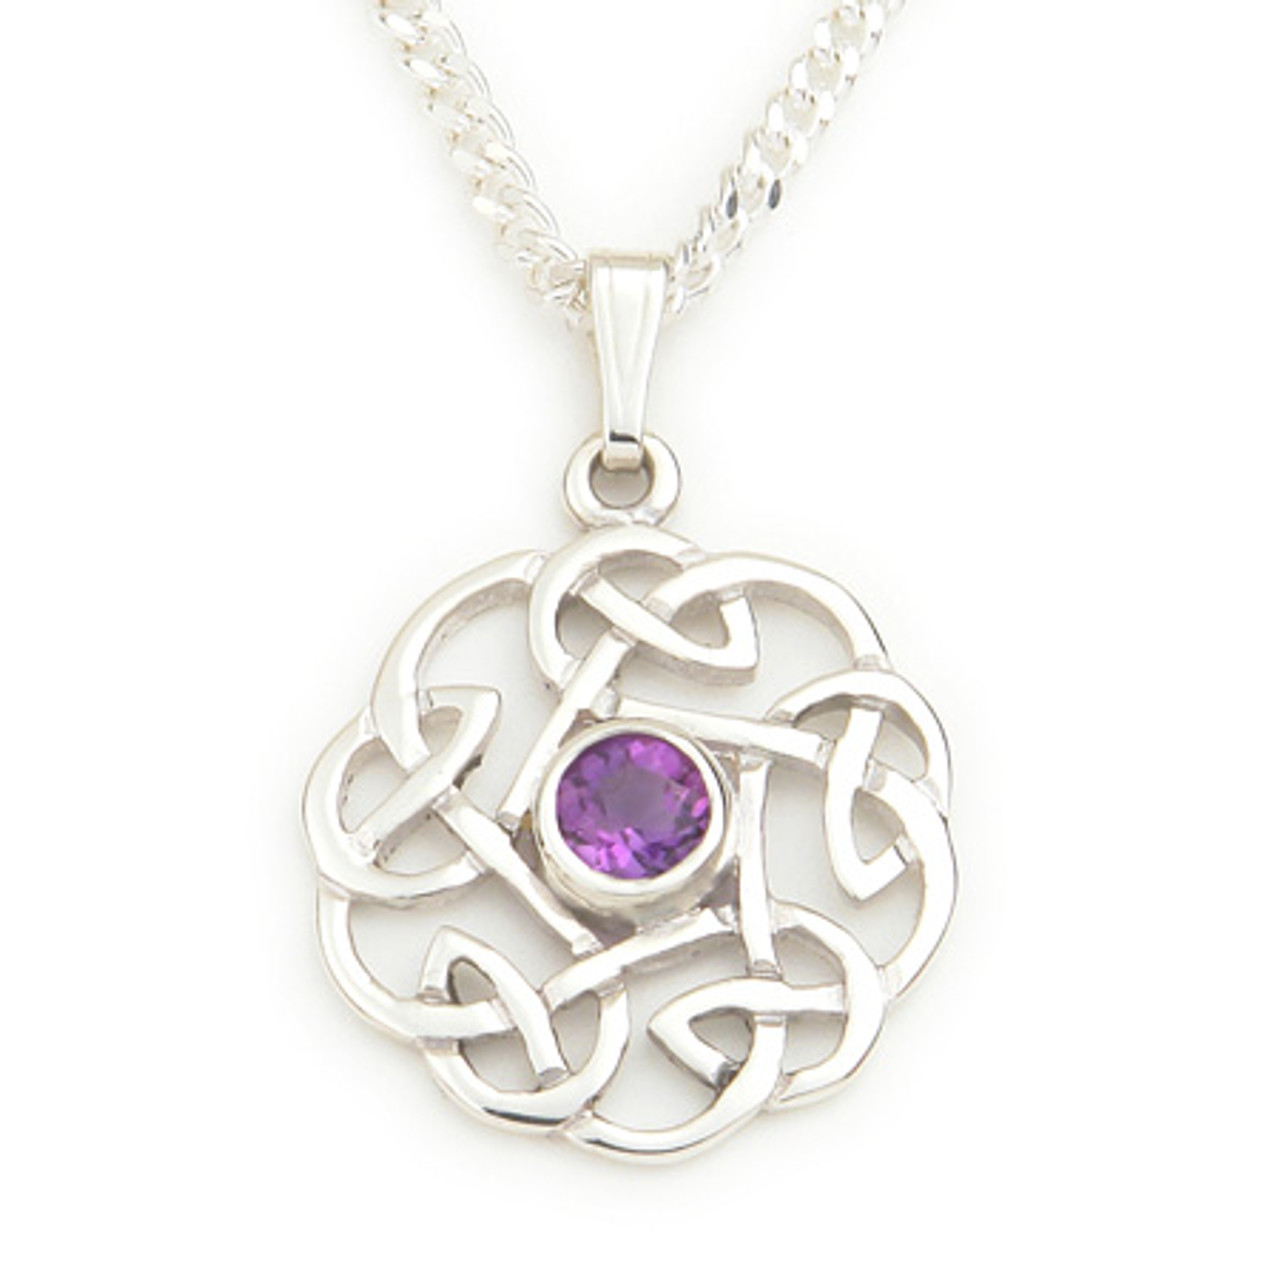 Round Celtic Knot Amethyst Pendant Necklace